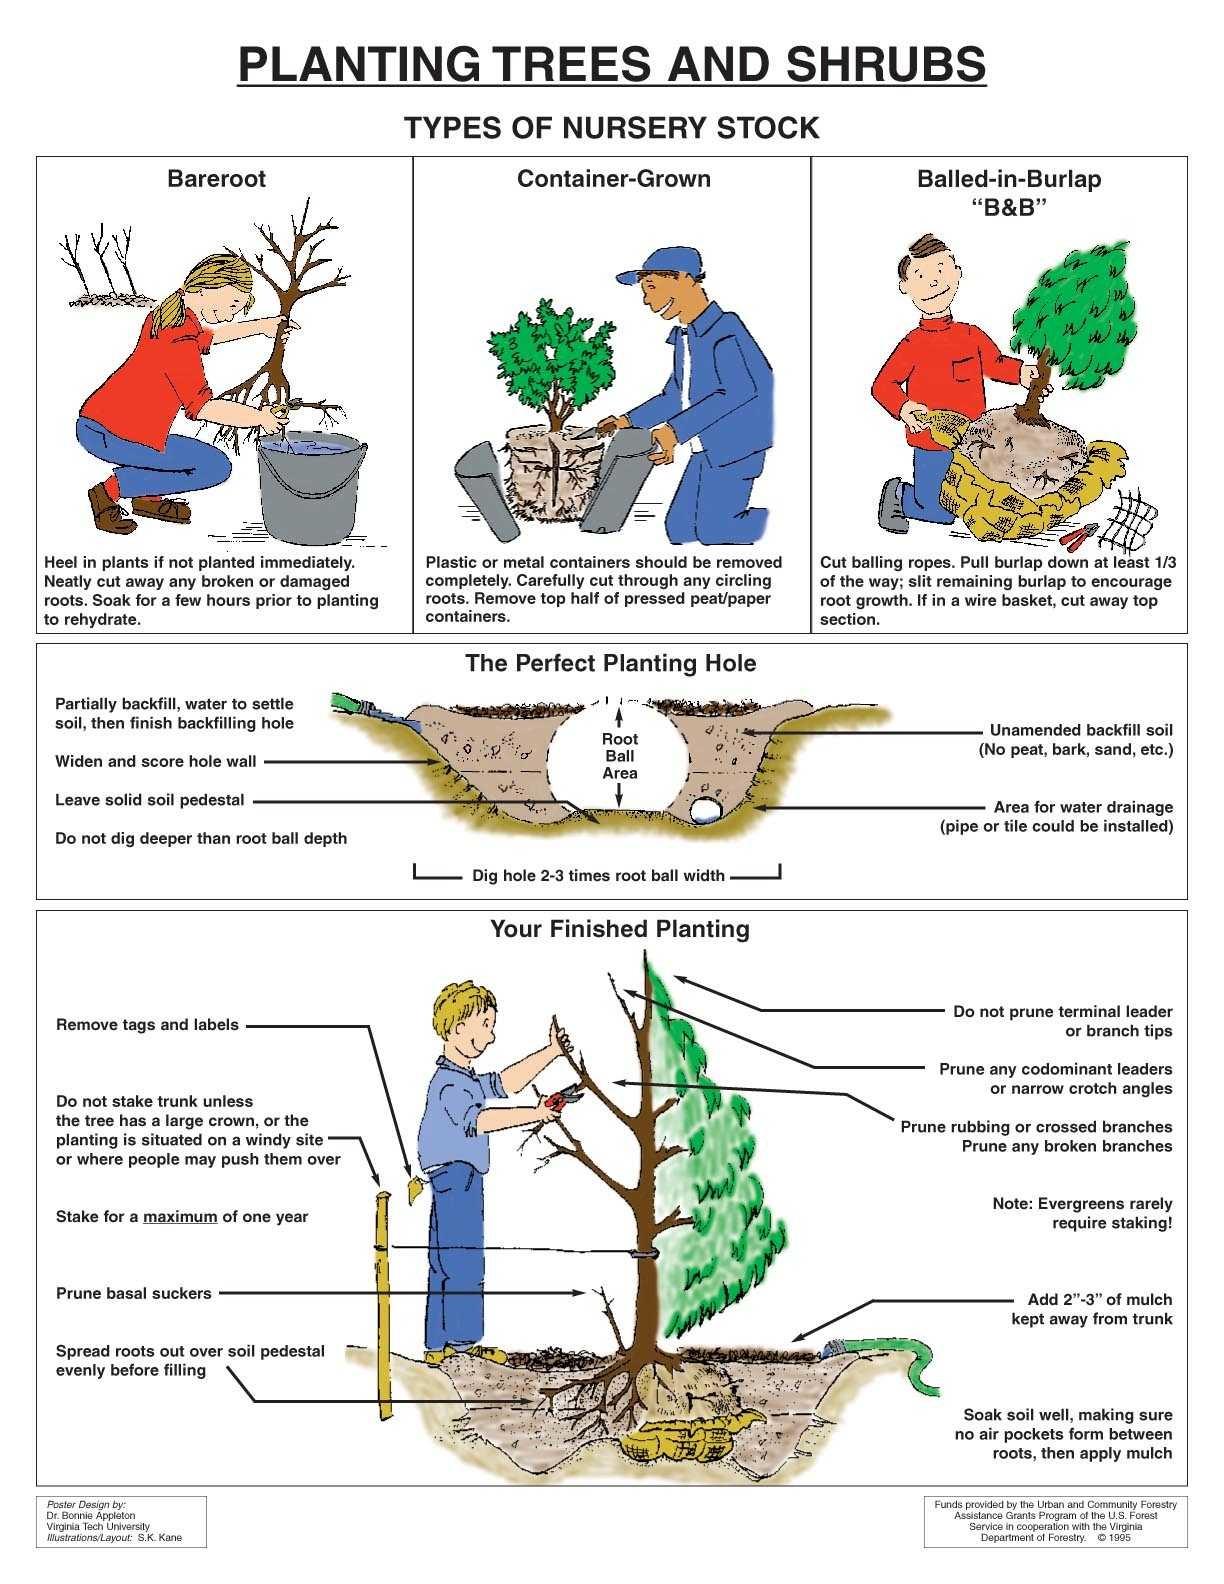 handout_Planting-Trees-Shrubs